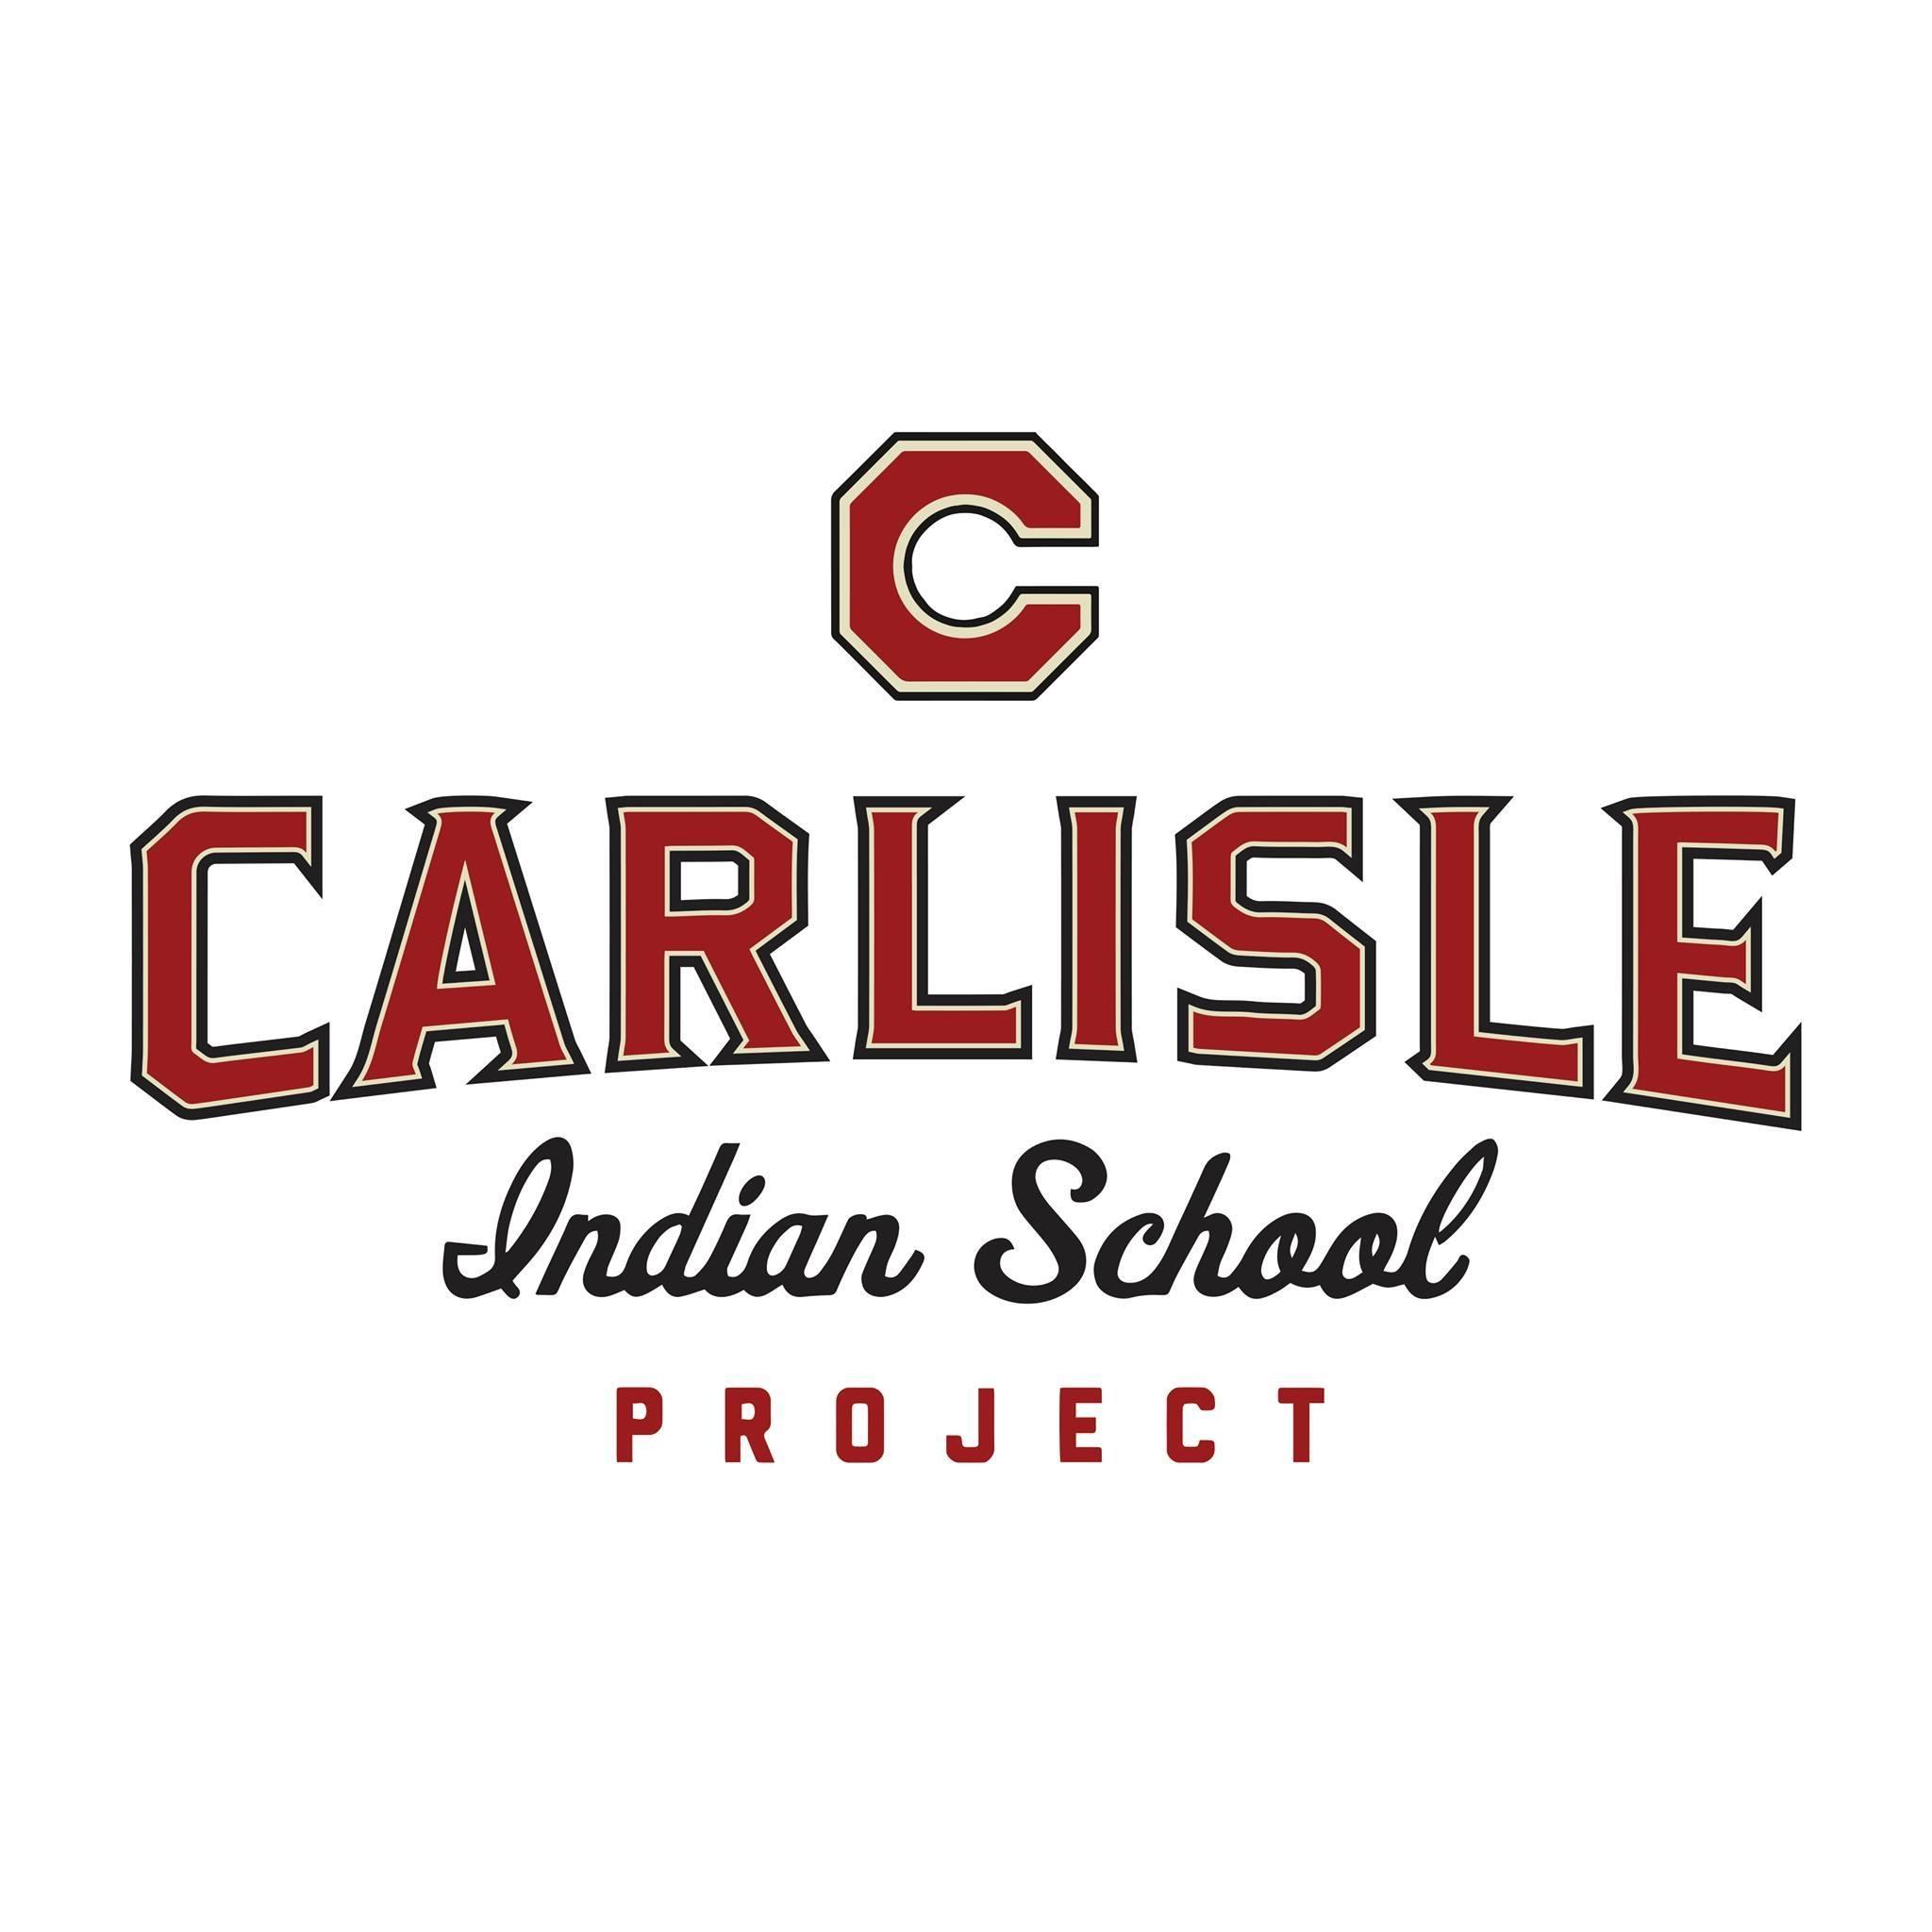 Carlisle Indian School Project logo